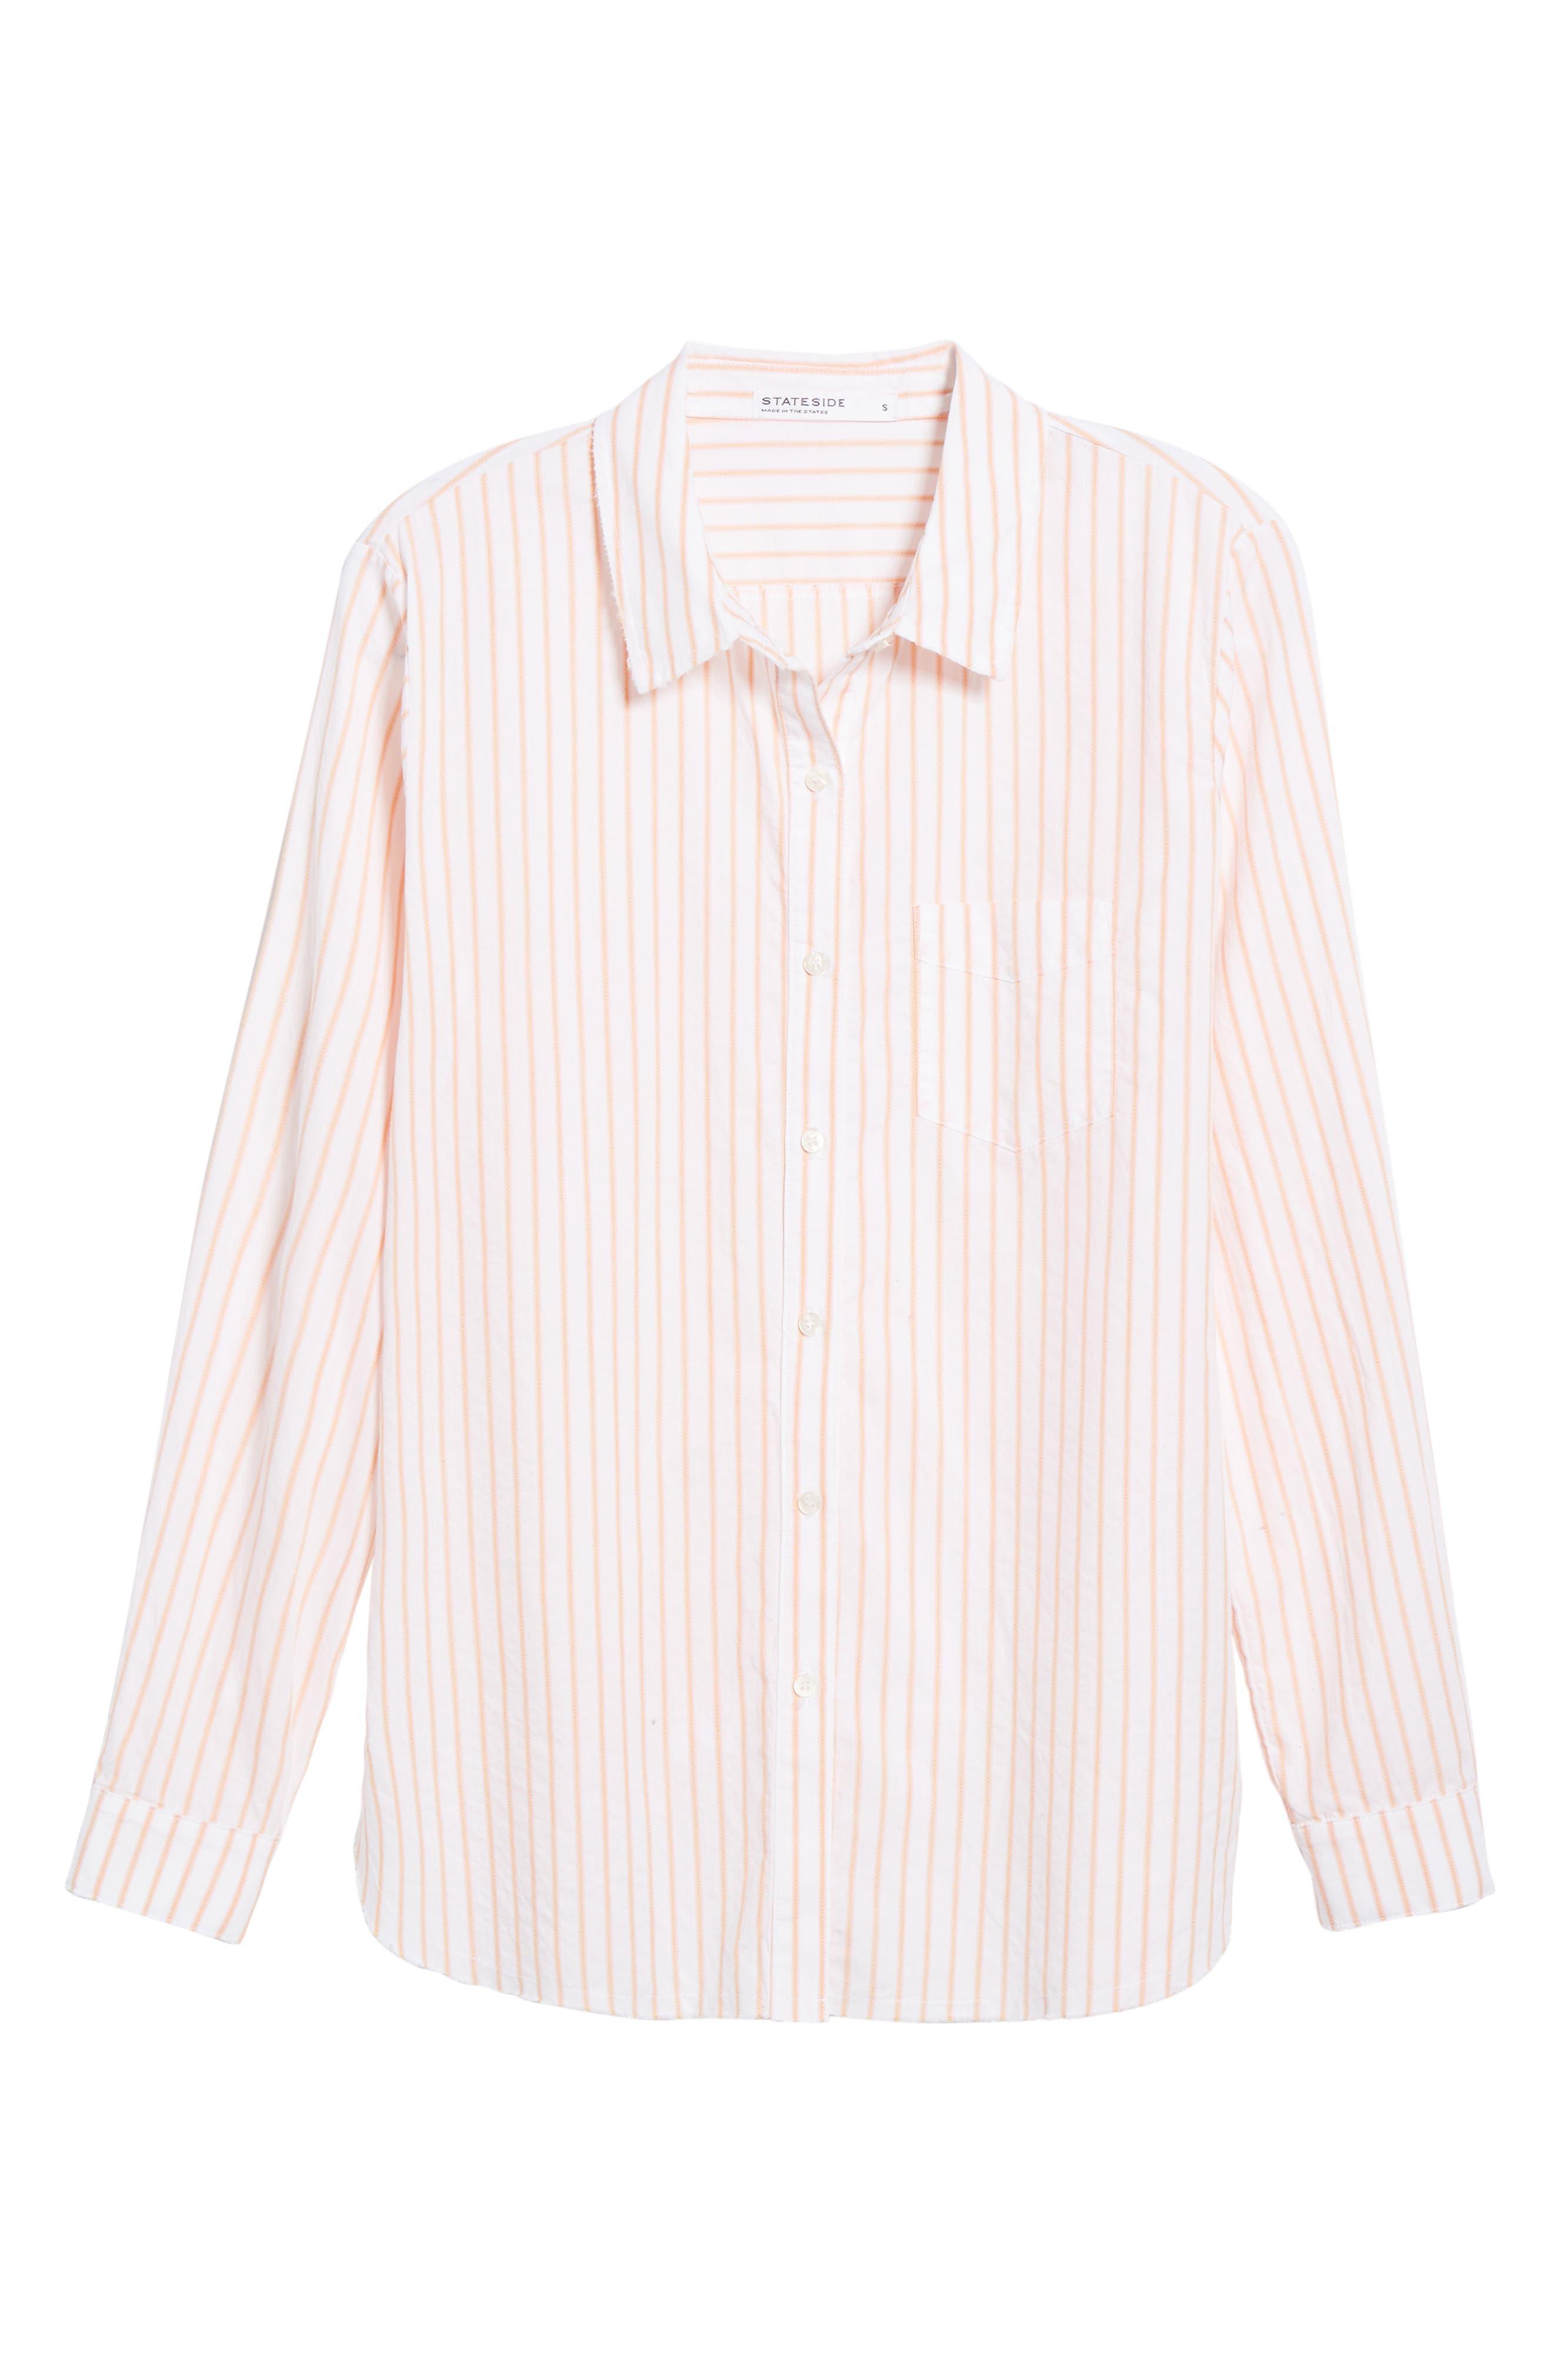 Stripe Oxford Shirt,                             Main thumbnail 1, color,                             Sorbet